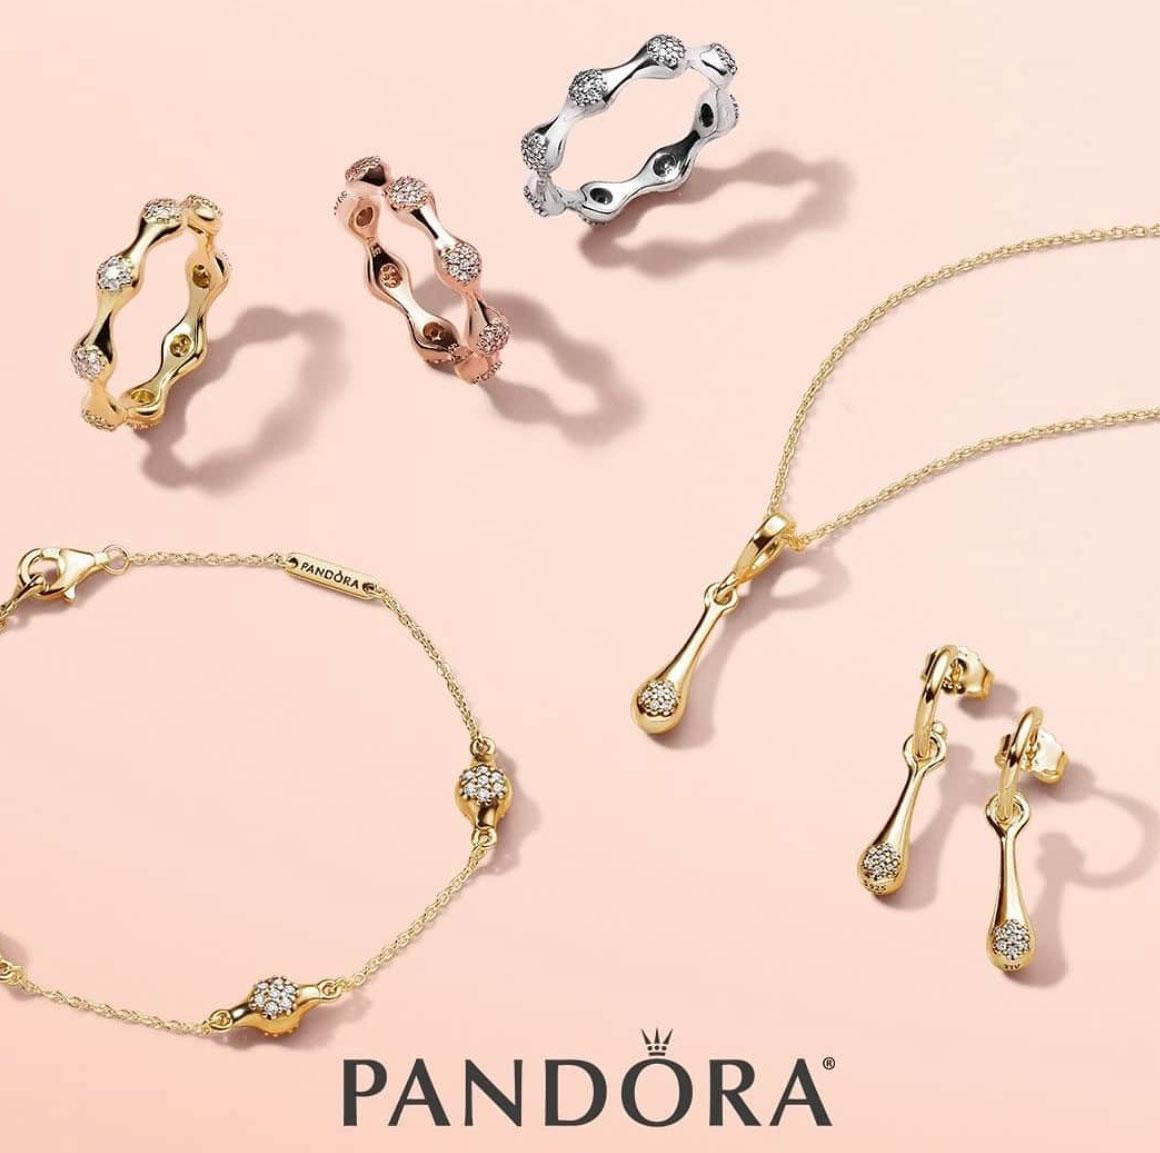 PANDORA Pre-Autumn 2018 Live Images - The Art of Pandora   More than ...